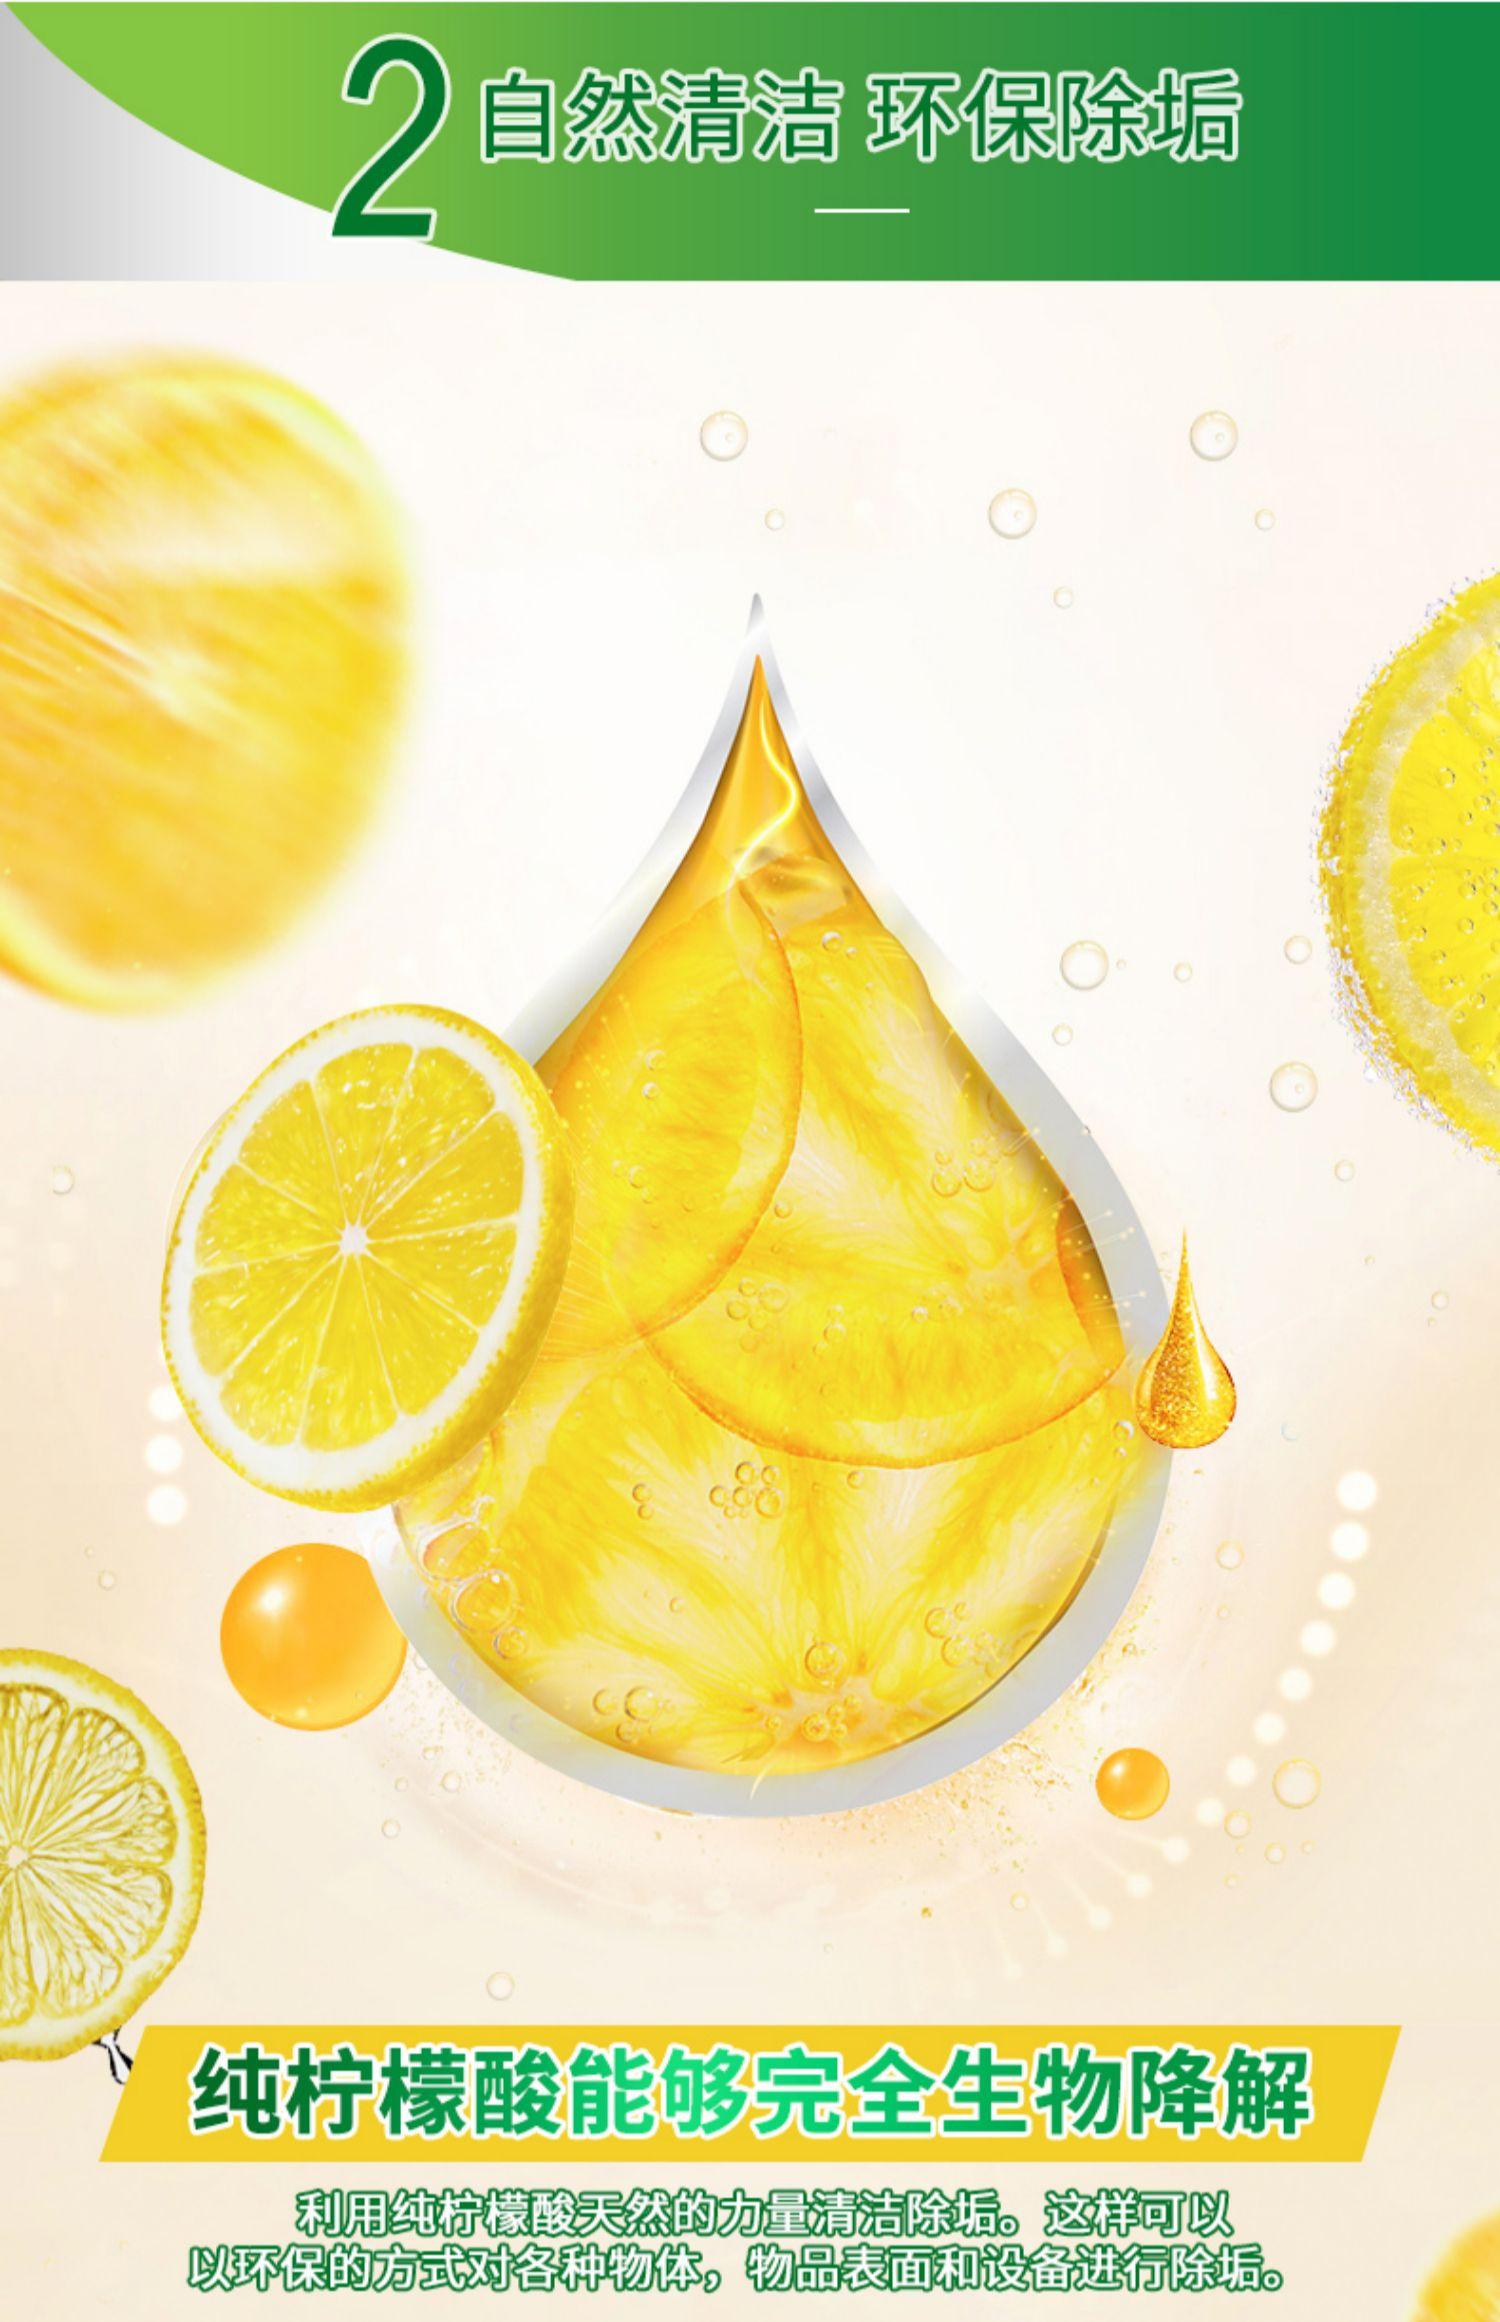 HEITMANN柠檬酸除垢剂去水垢食品级清除剂清洁剂电热水壶家用强力商品详情图